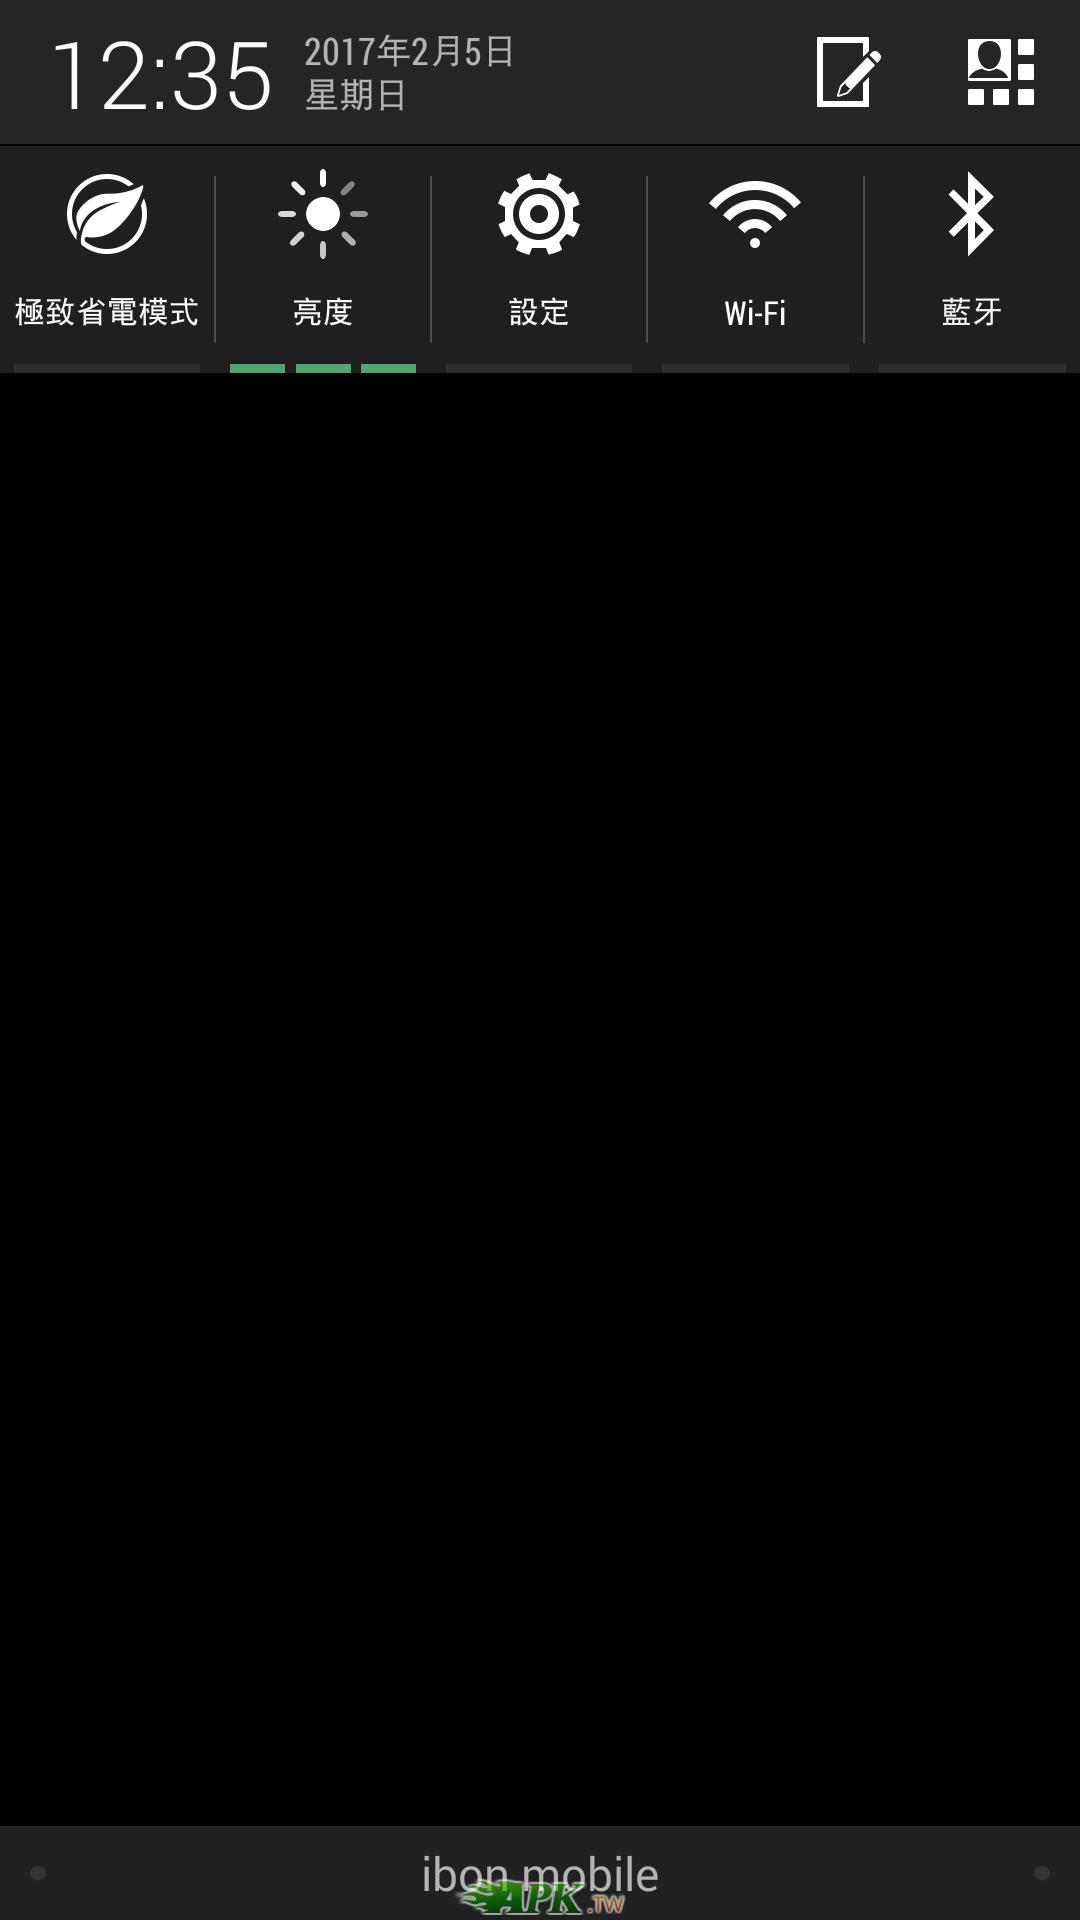 Screenshot_2017-02-05-12-35-41.png